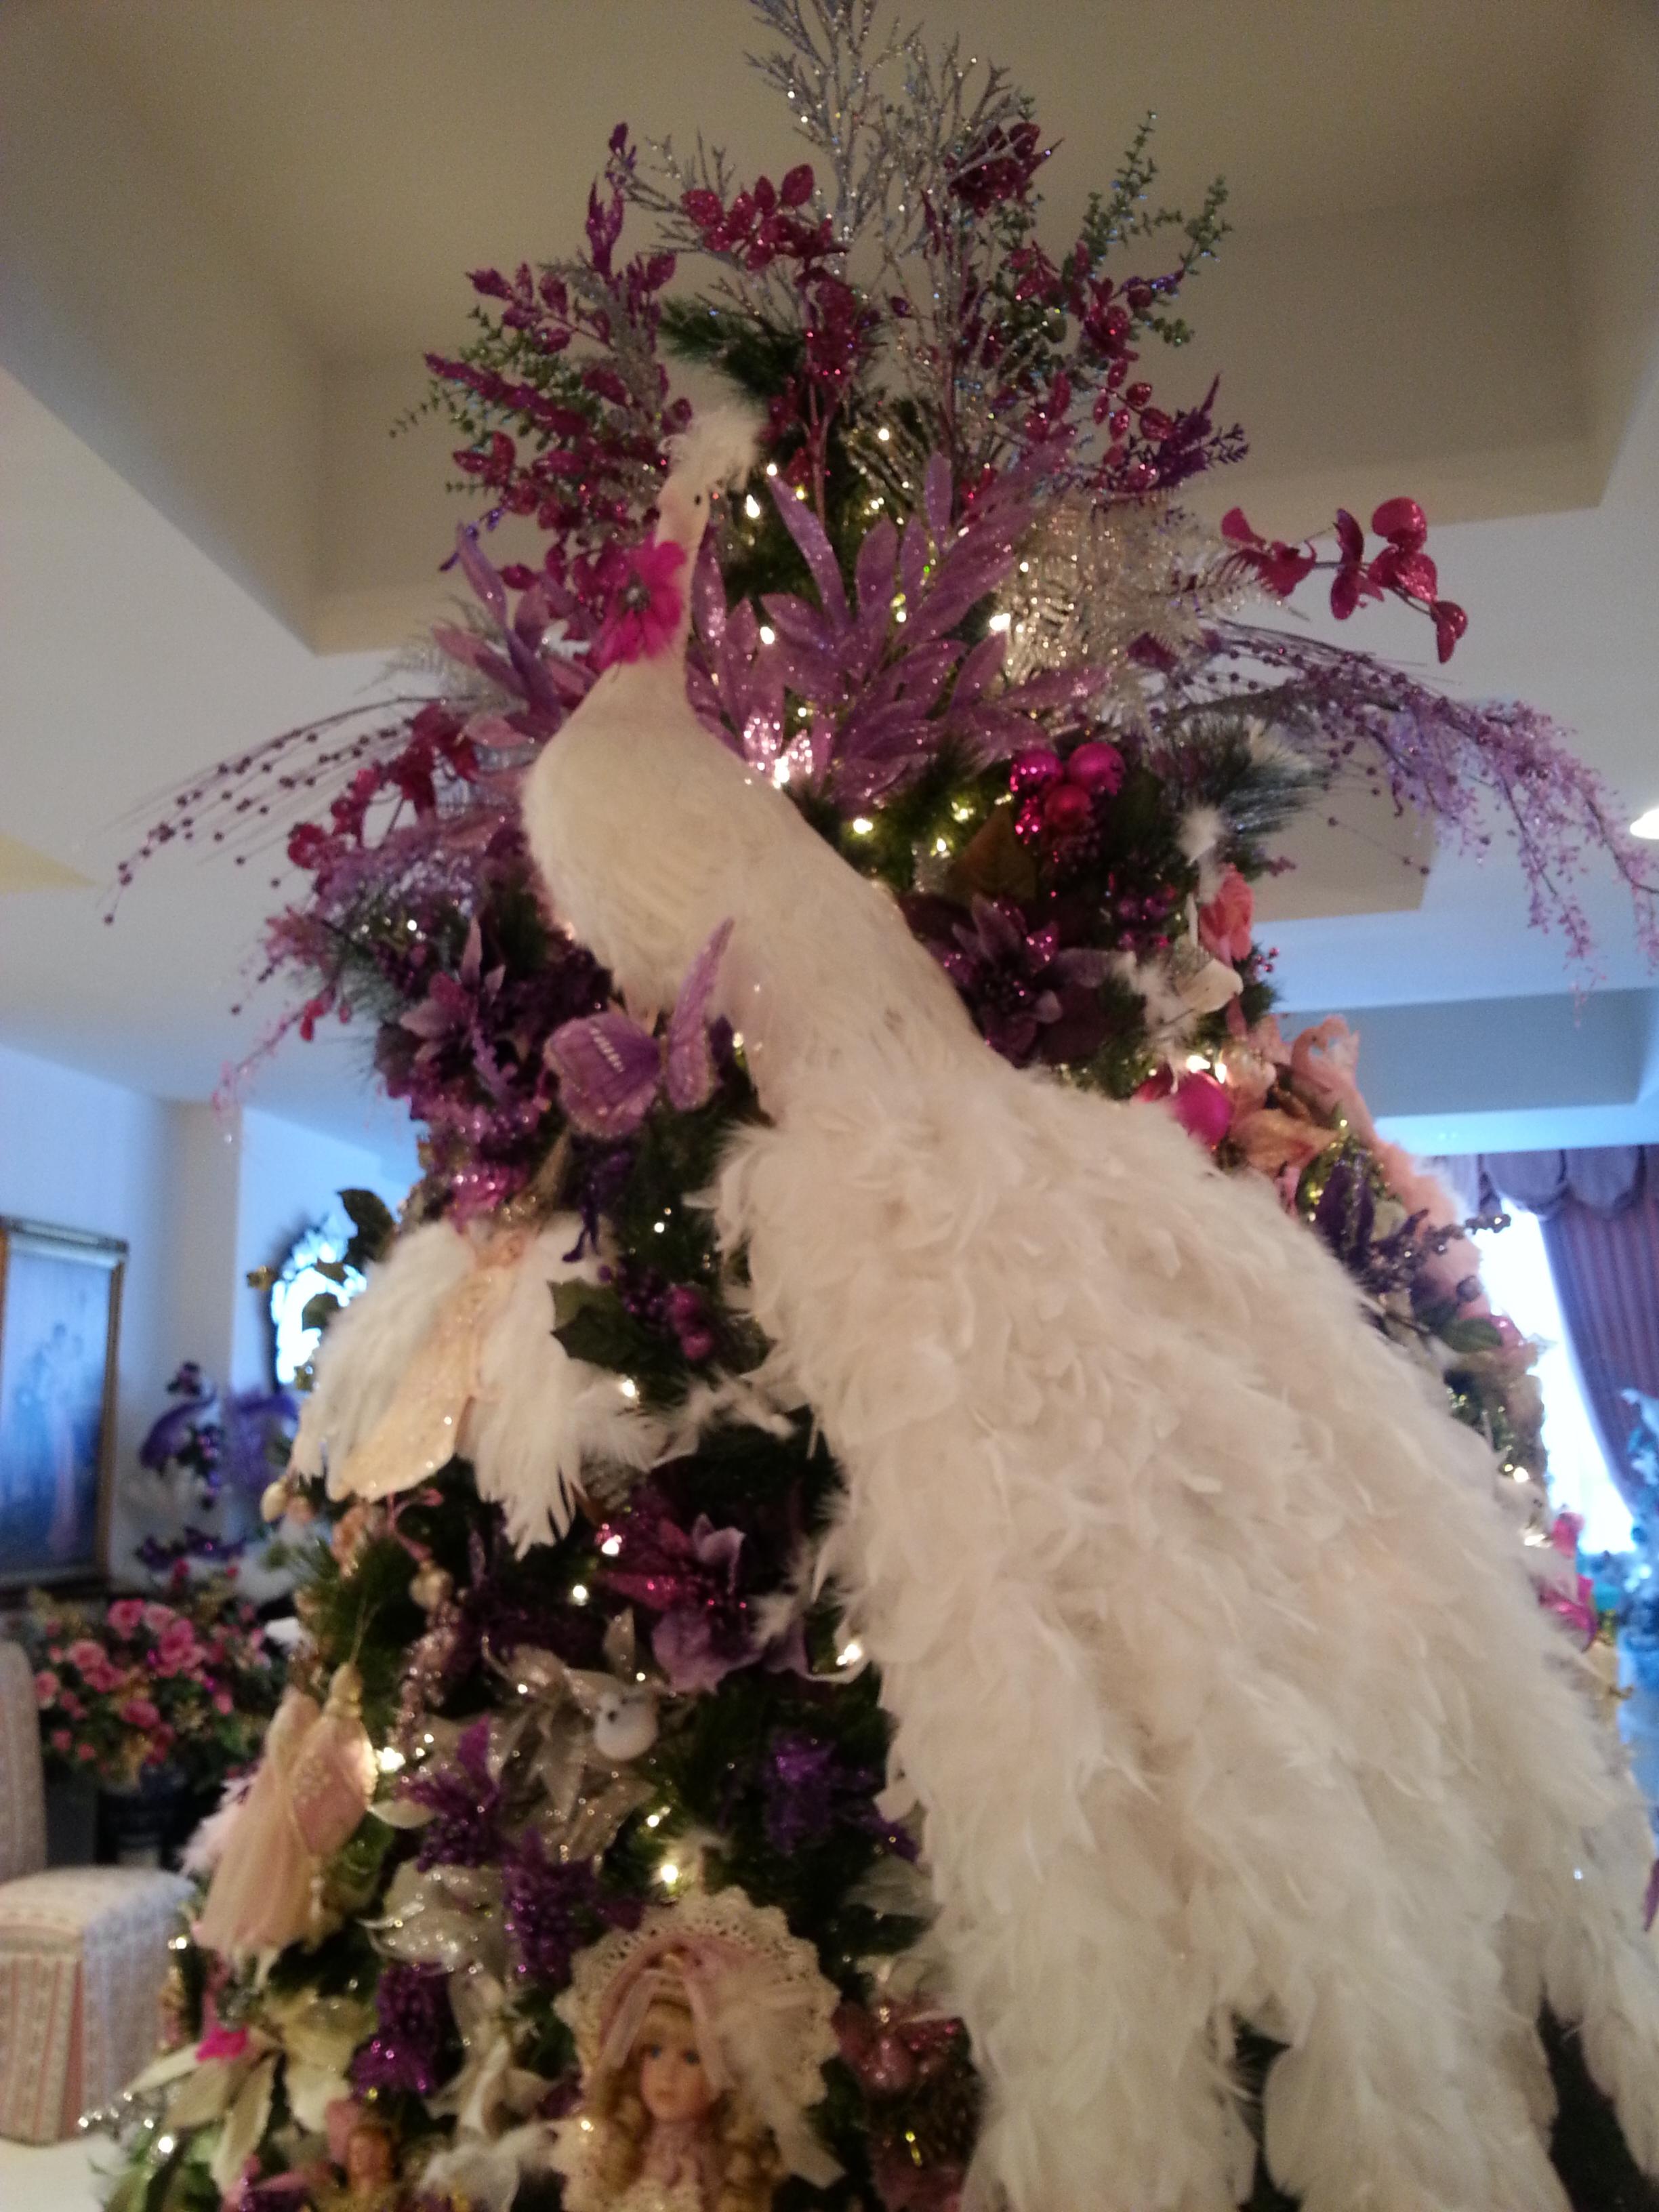 This year's tree.